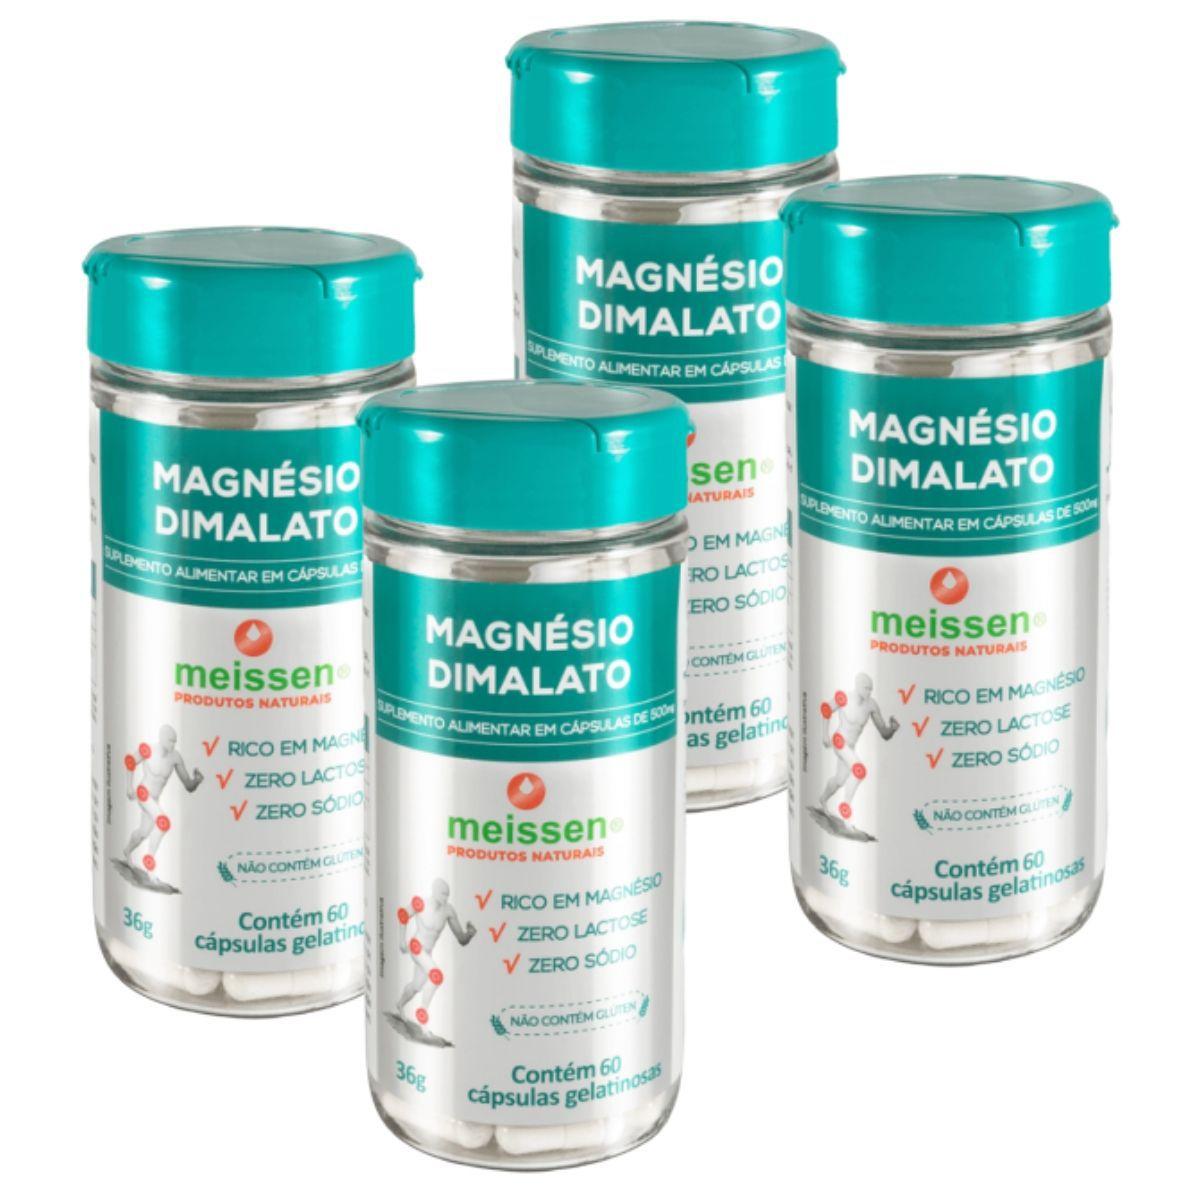 4 Magnesio Dimalato  Puro - 240 Capsulas - 2 x Dia - Meissen